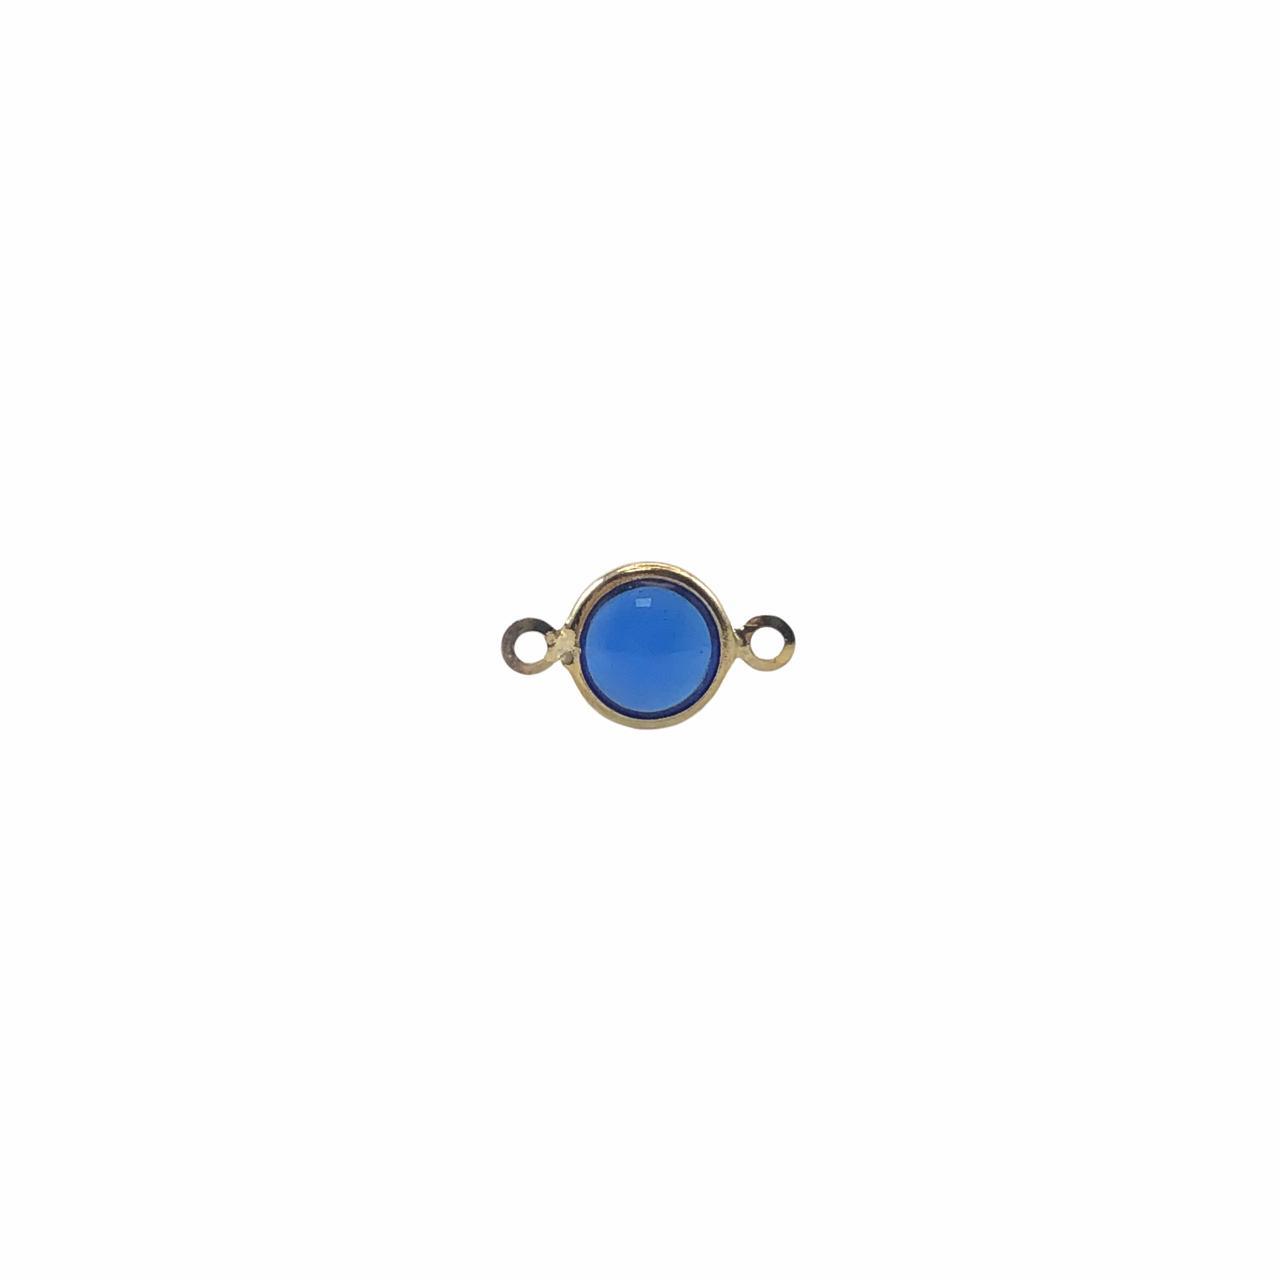 ETM580 - Entremeio De Vidro Sapphire 8mm Banhado Cor Dourado - 4Unids